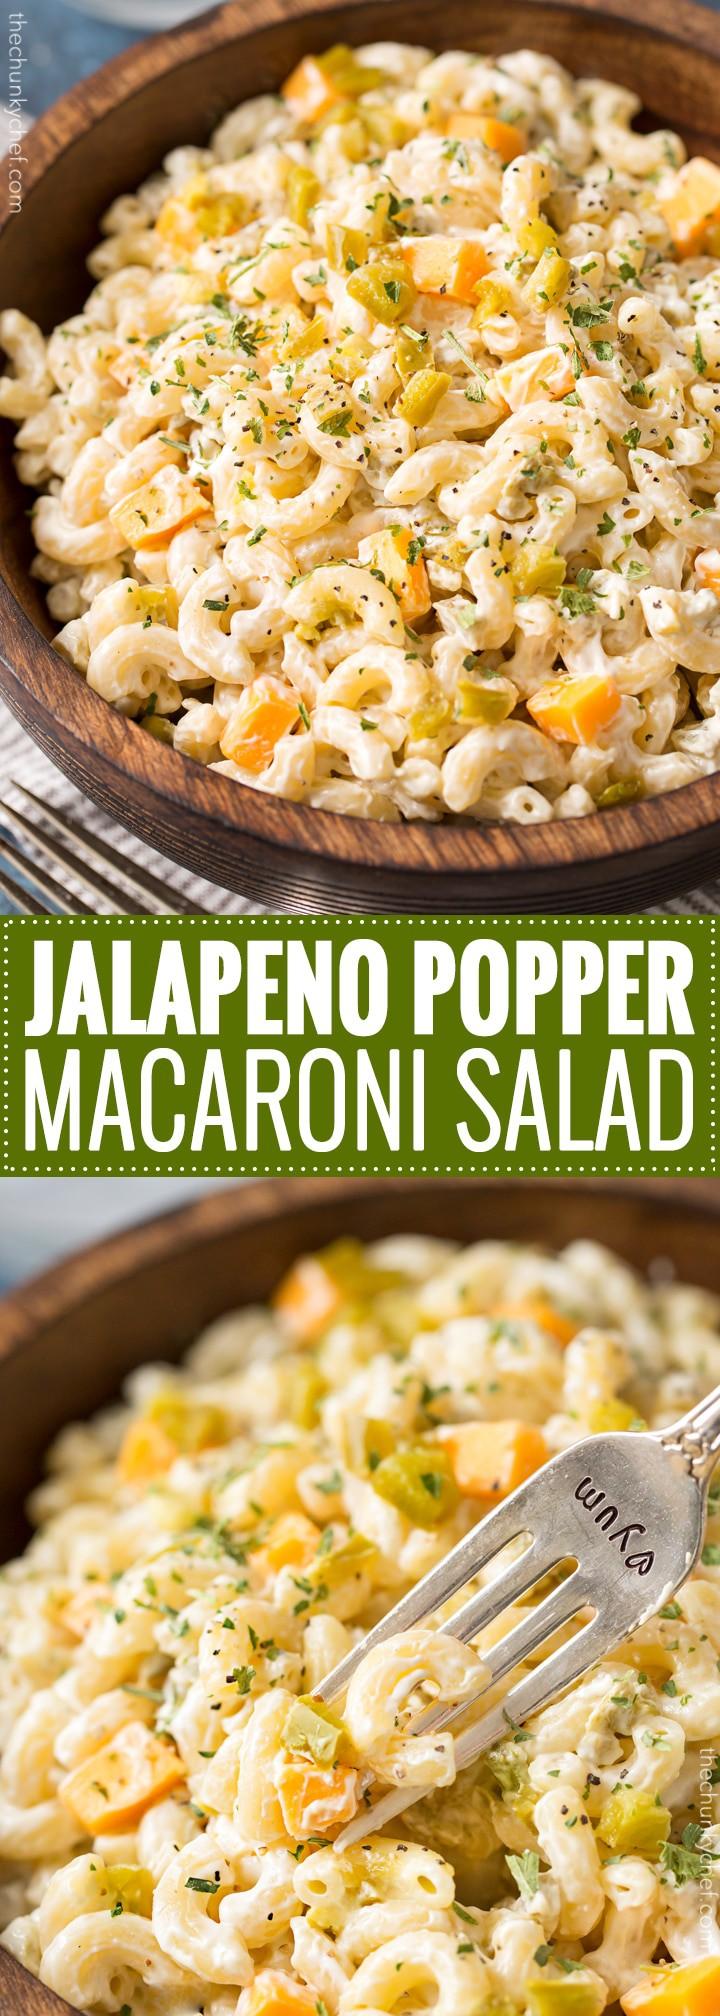 Jalapeno popper macaroni salad